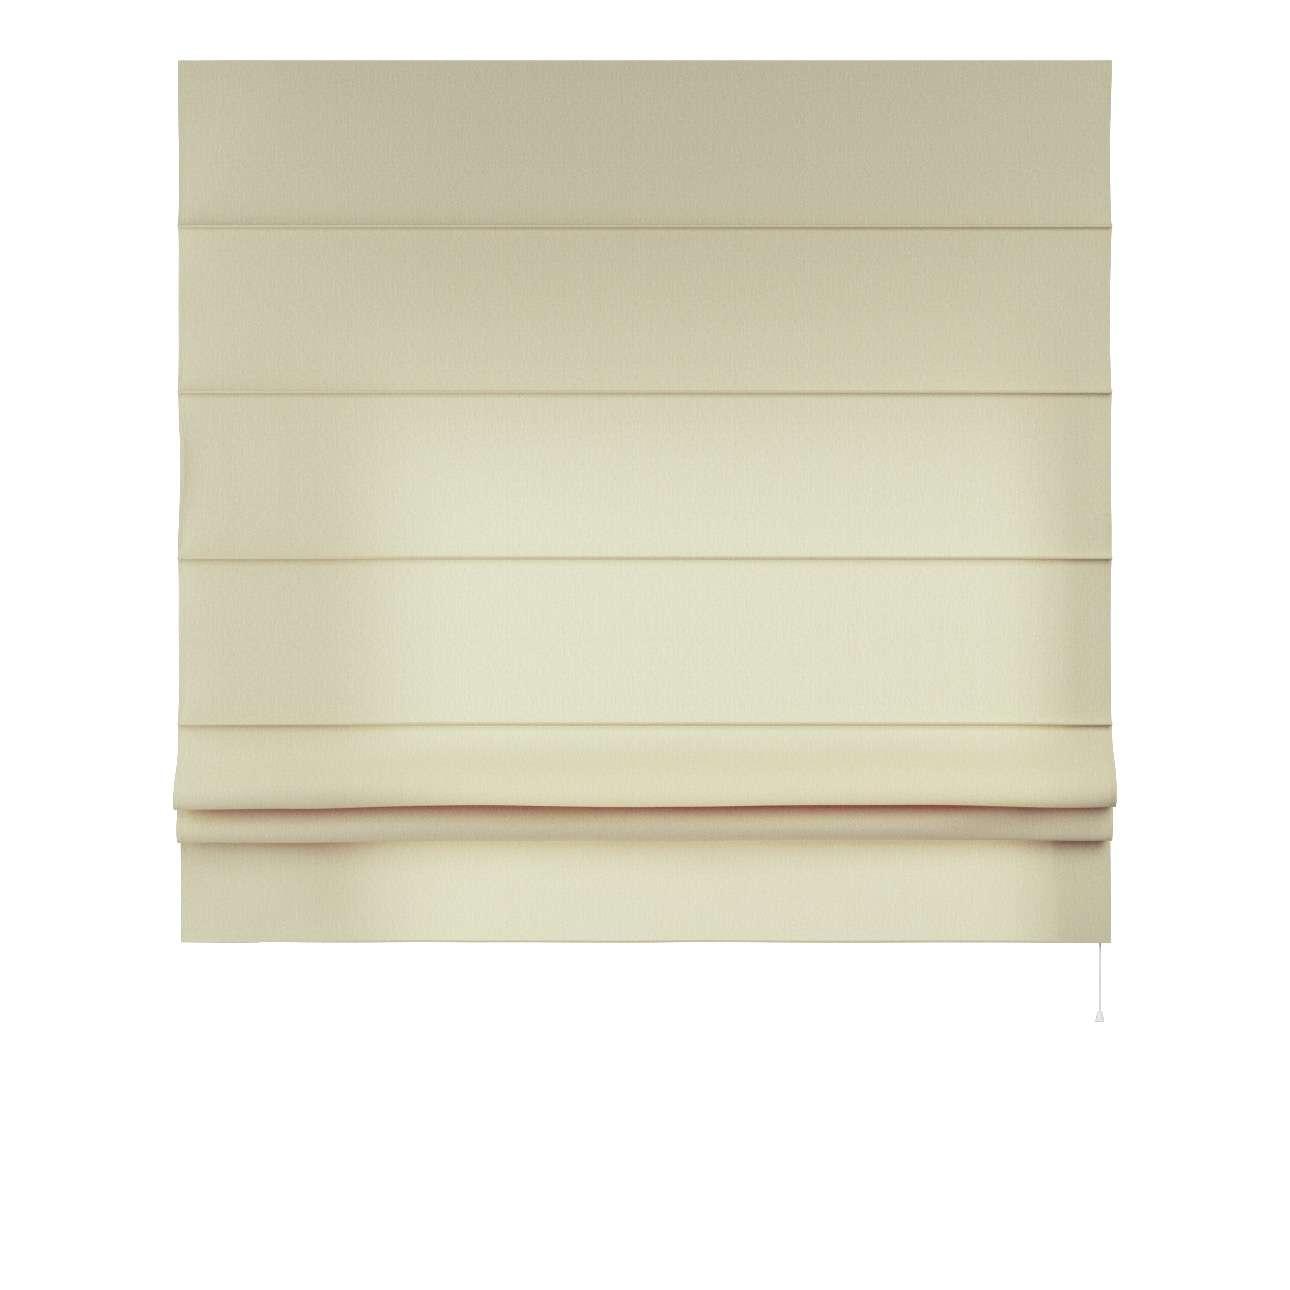 Vouwgordijn Padva 80 x 170 cm van de collectie Chenille, Stof: 702-22